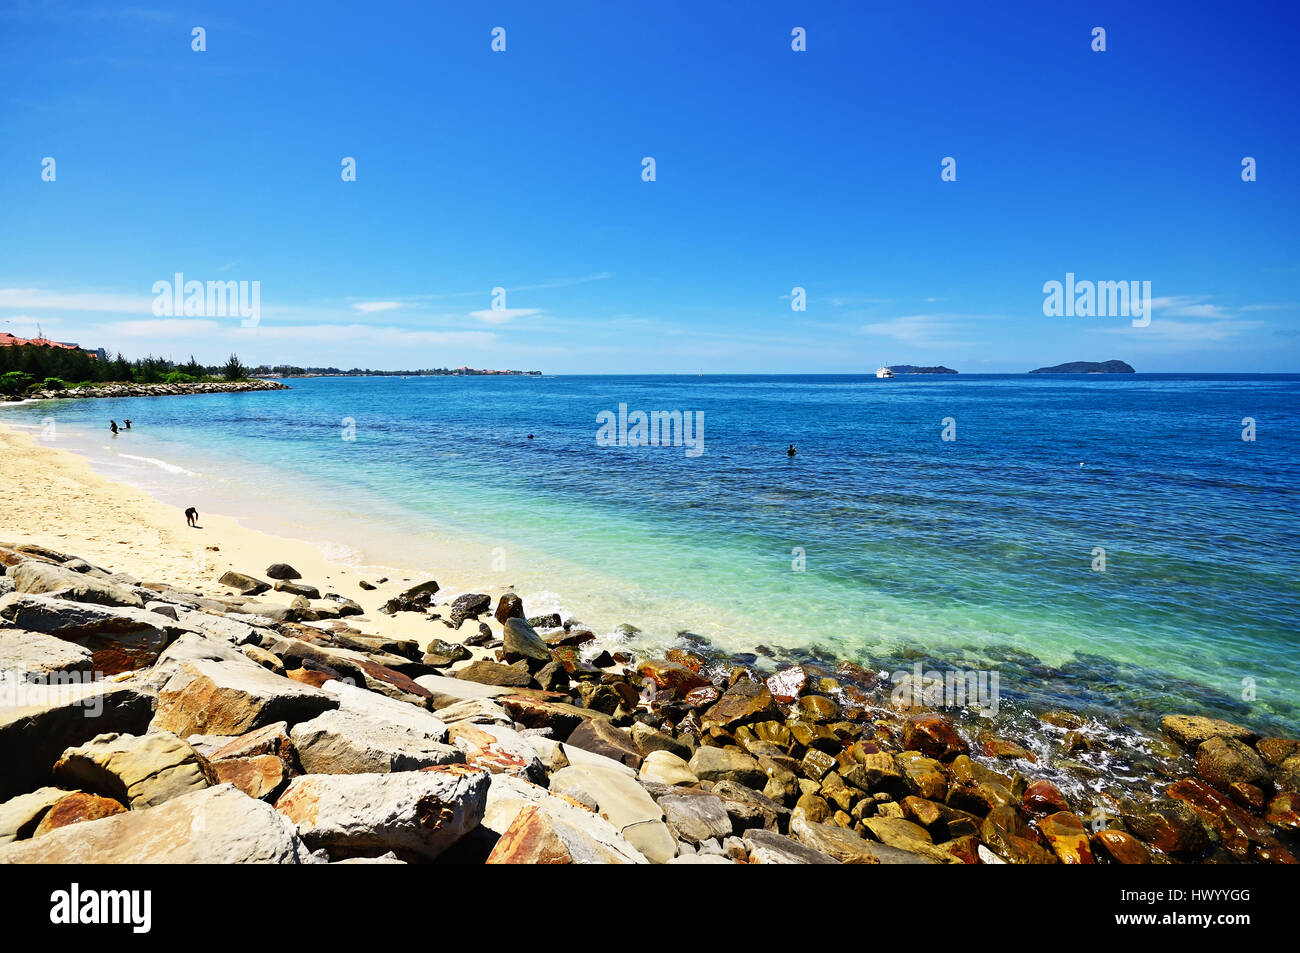 Sunny day at Kota Kinabalu Beach in Sabah Borneo, Malaysia. - Stock Image